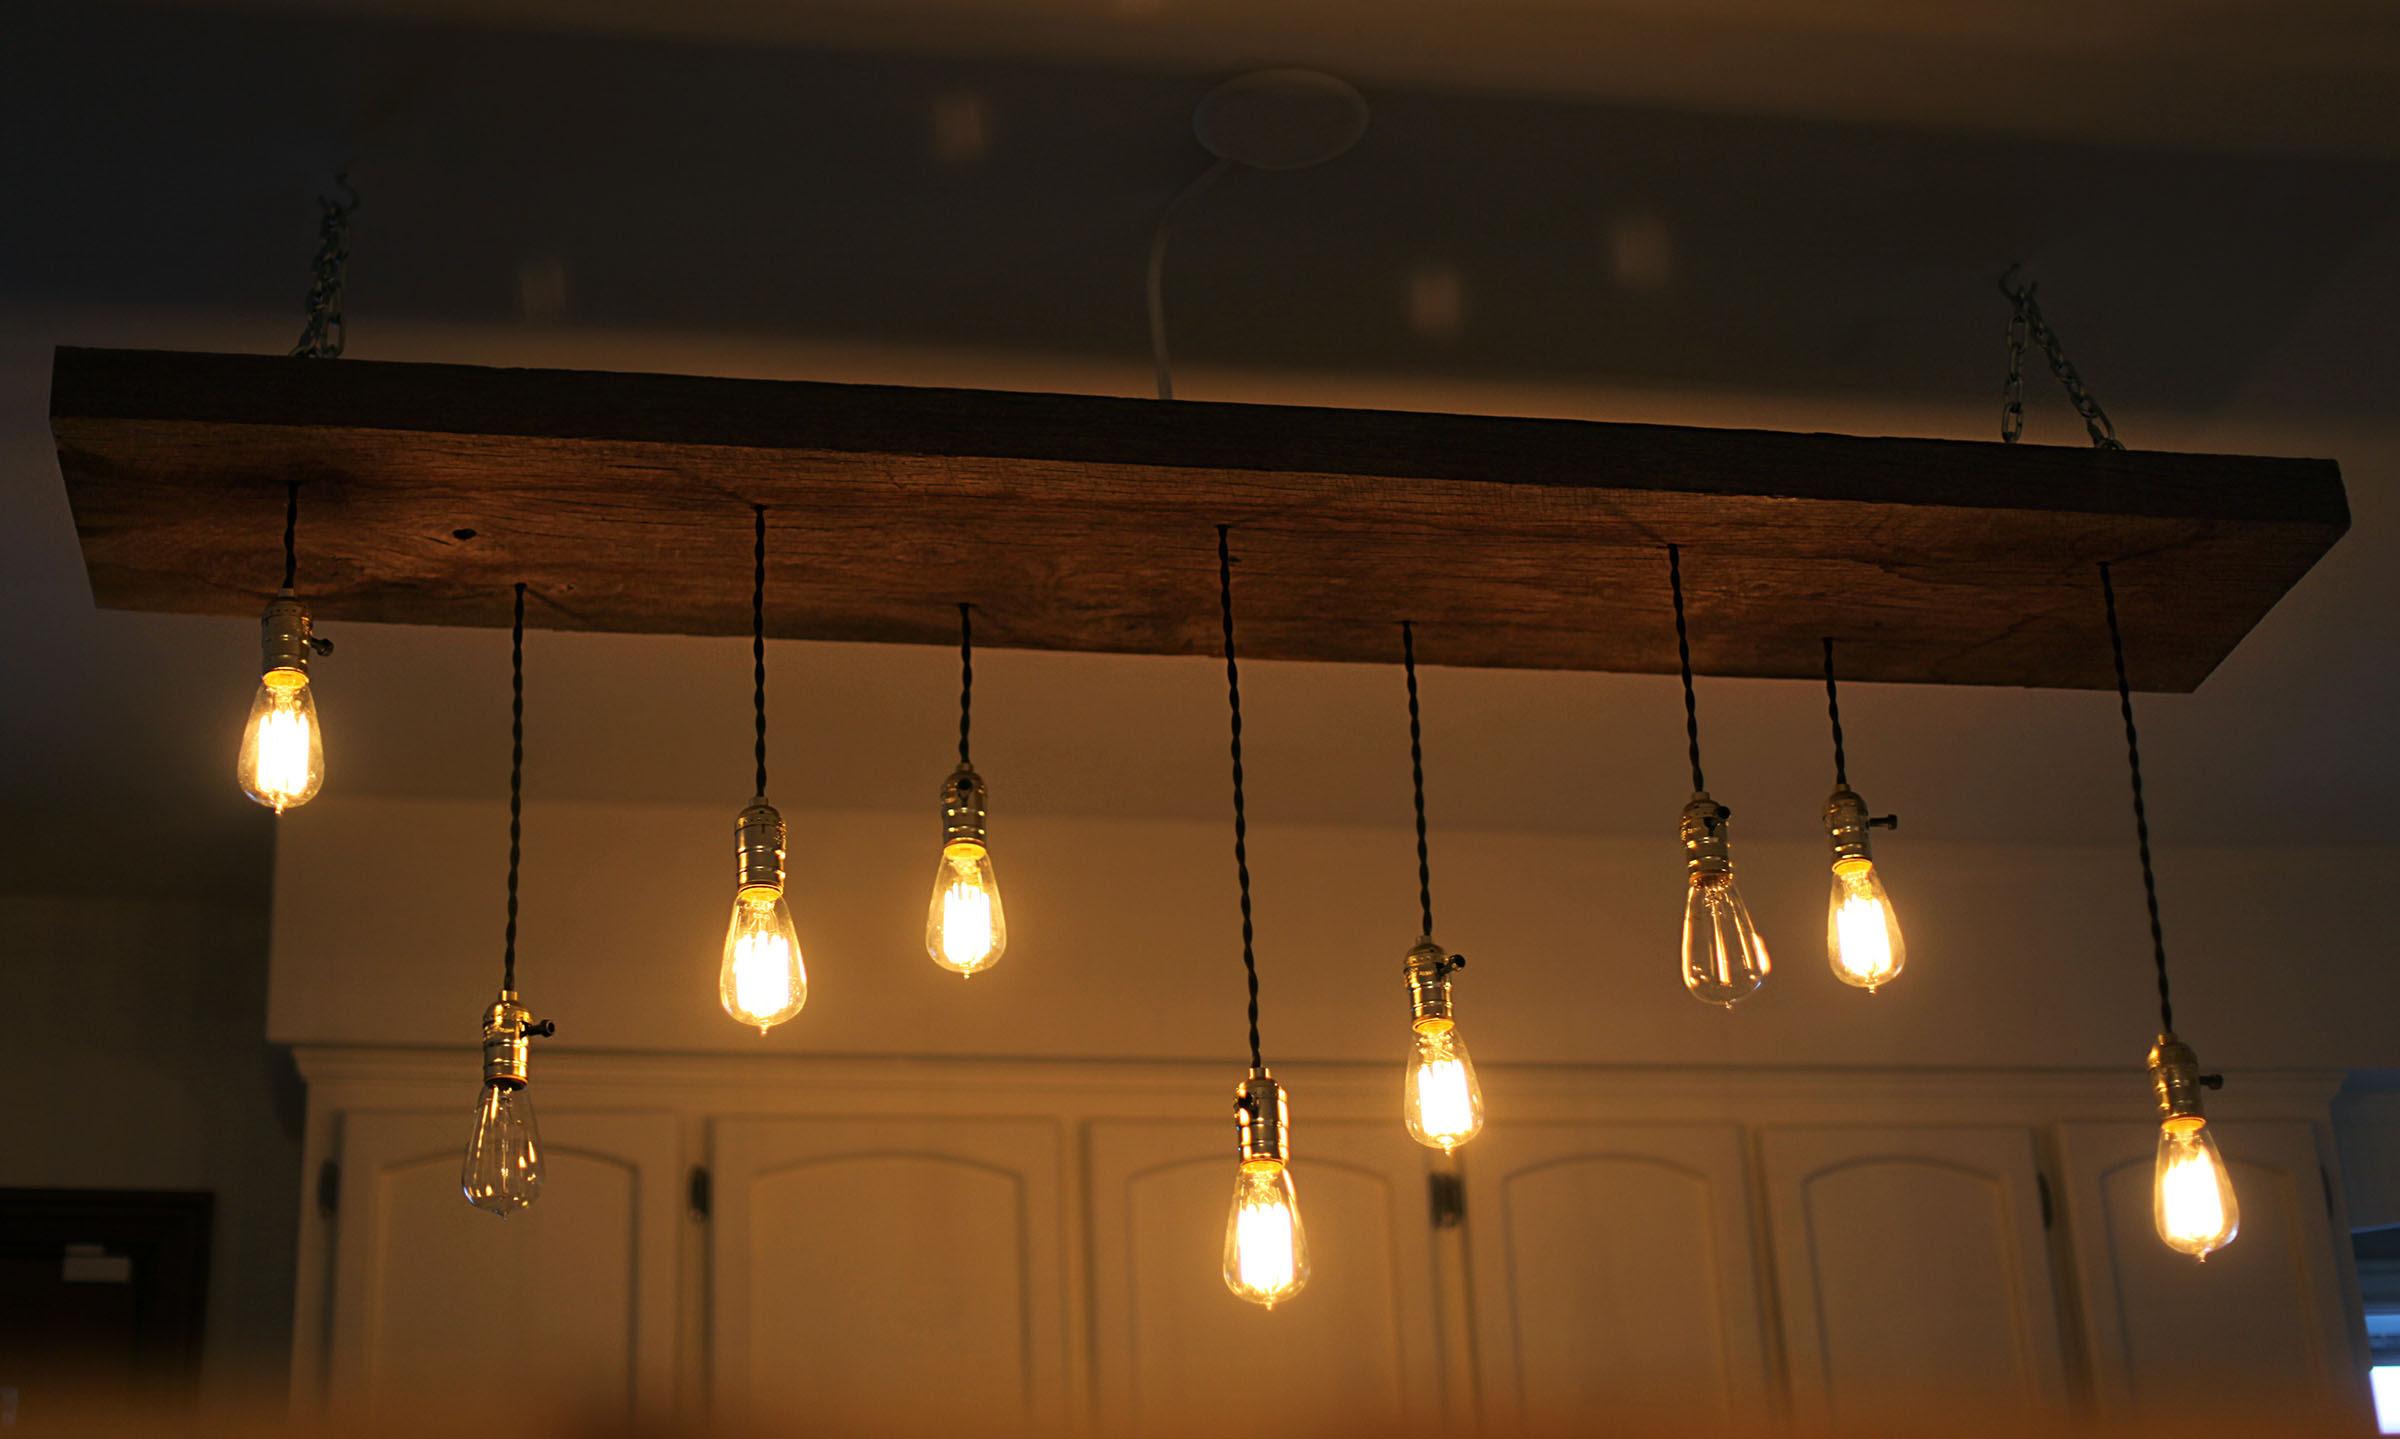 DIY reclaimed lumber hanging Edison bulb chandelier